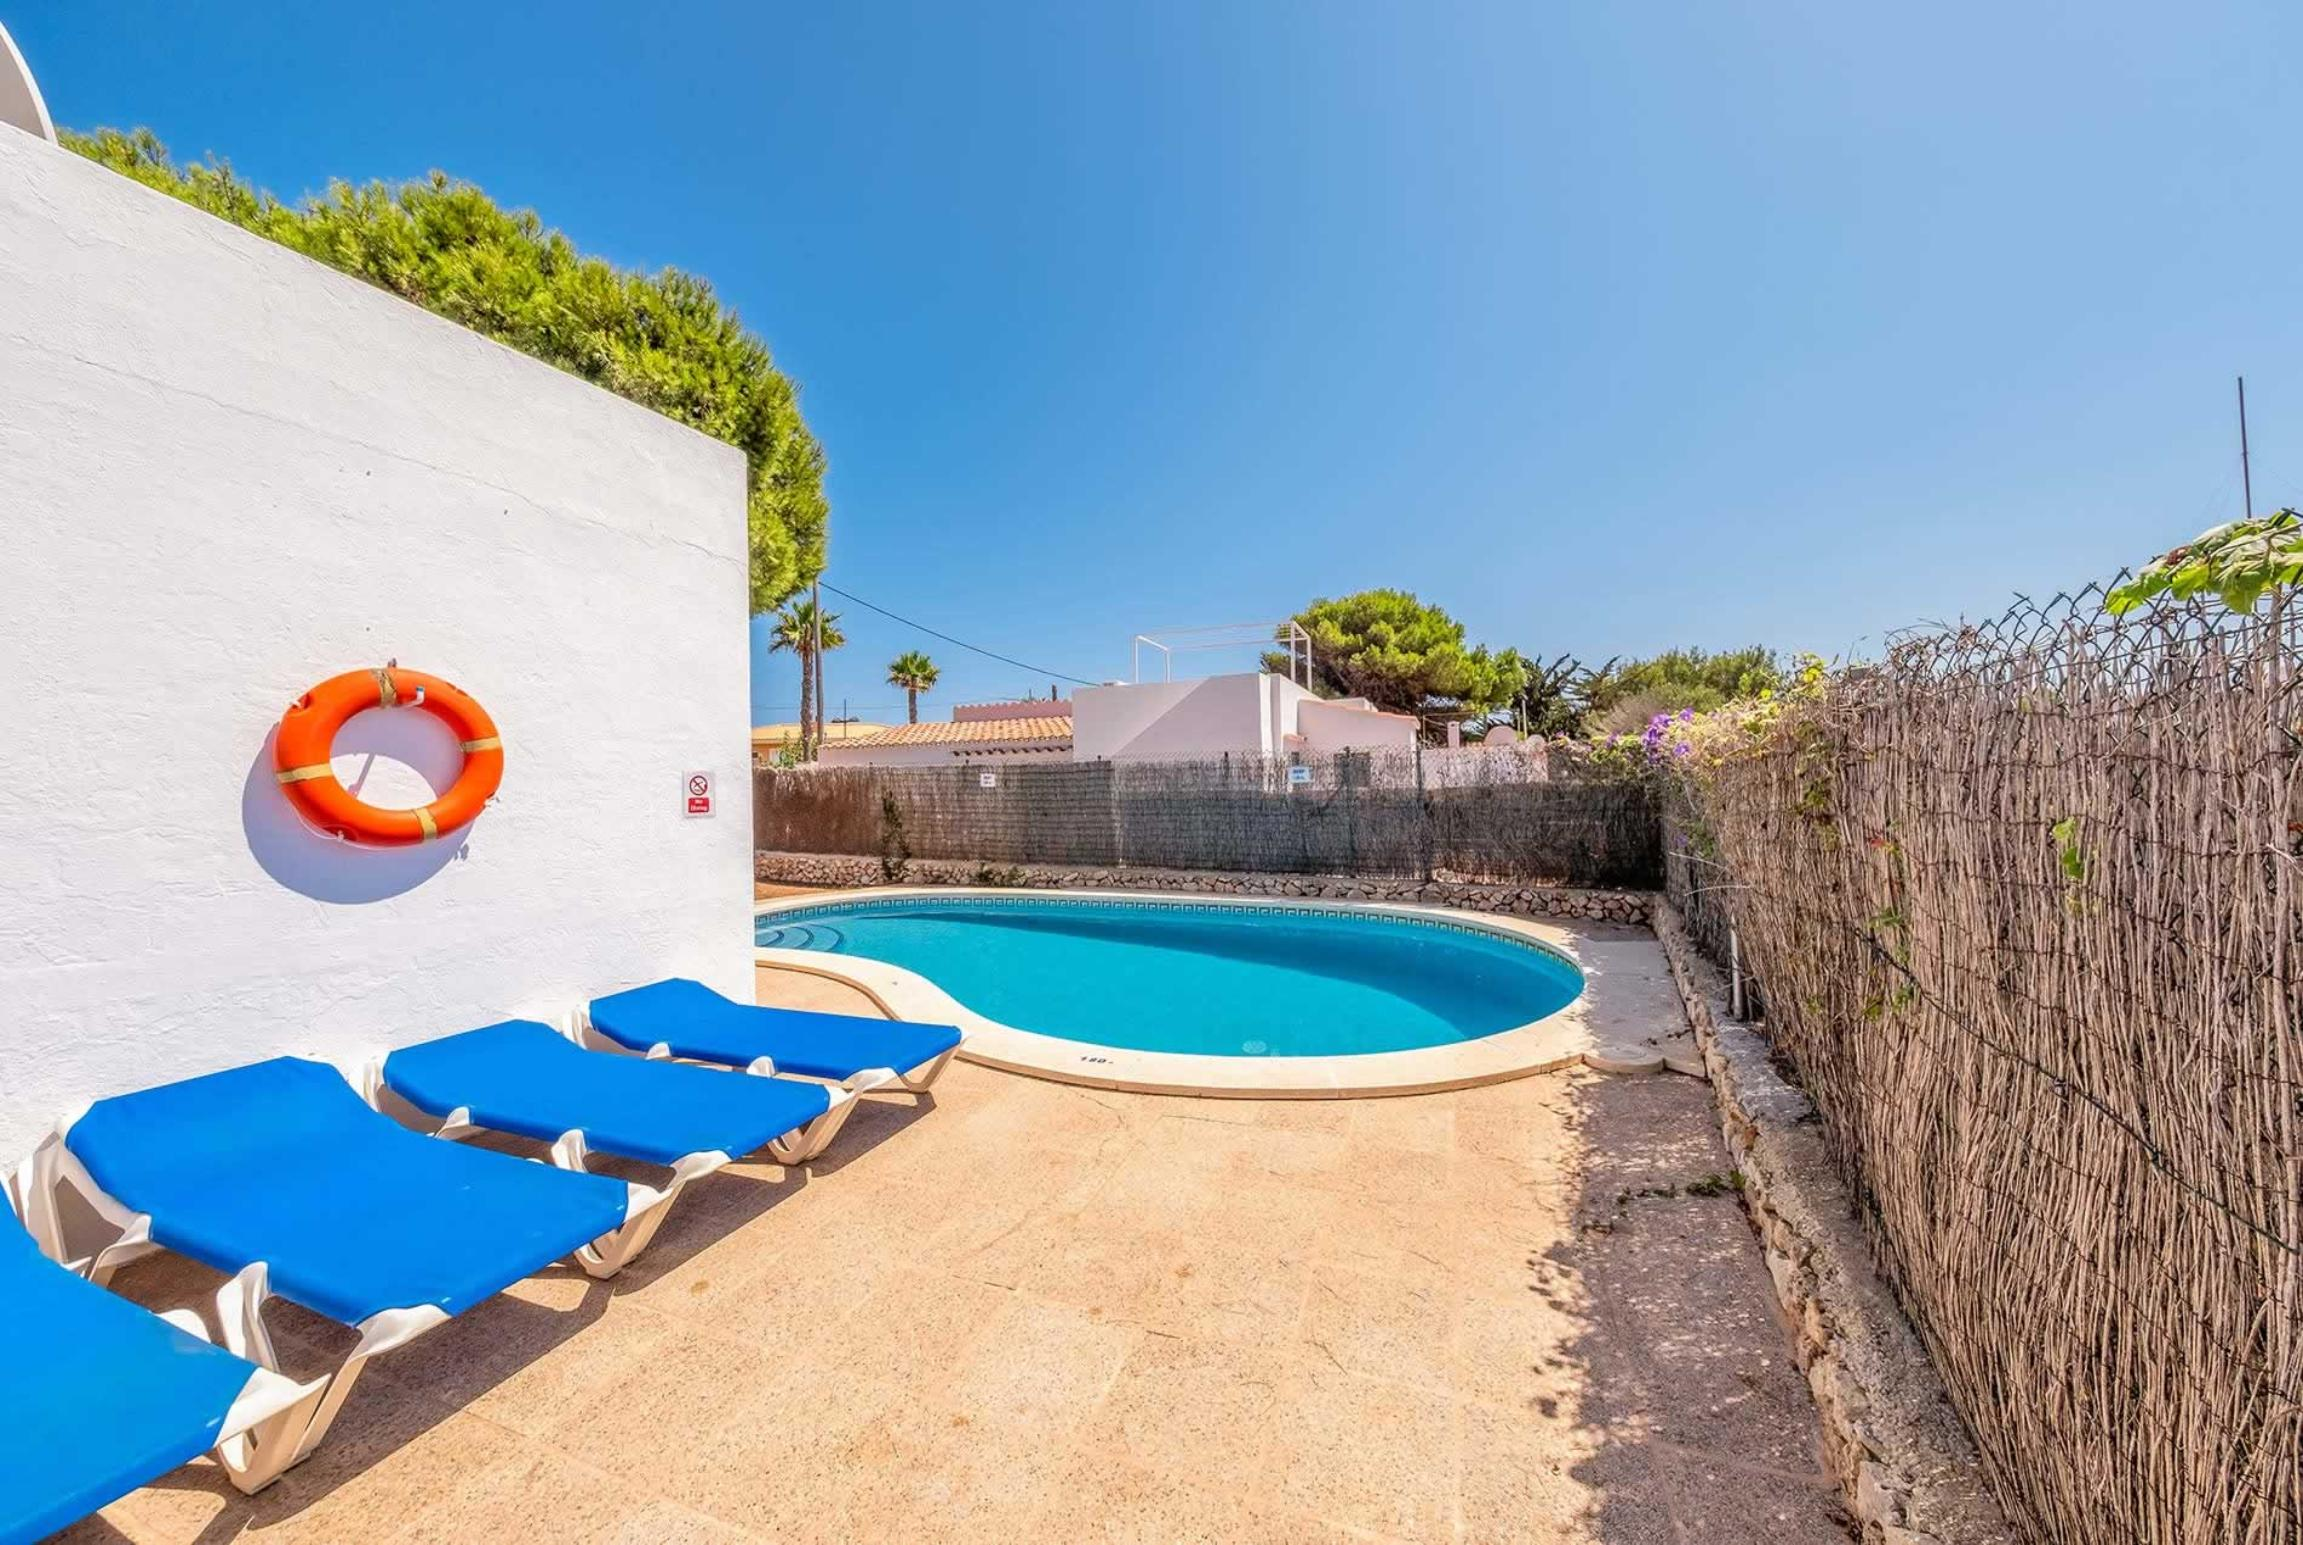 Ferienhaus Iris Prima (2653680), Punta Prima, Menorca, Balearische Inseln, Spanien, Bild 24